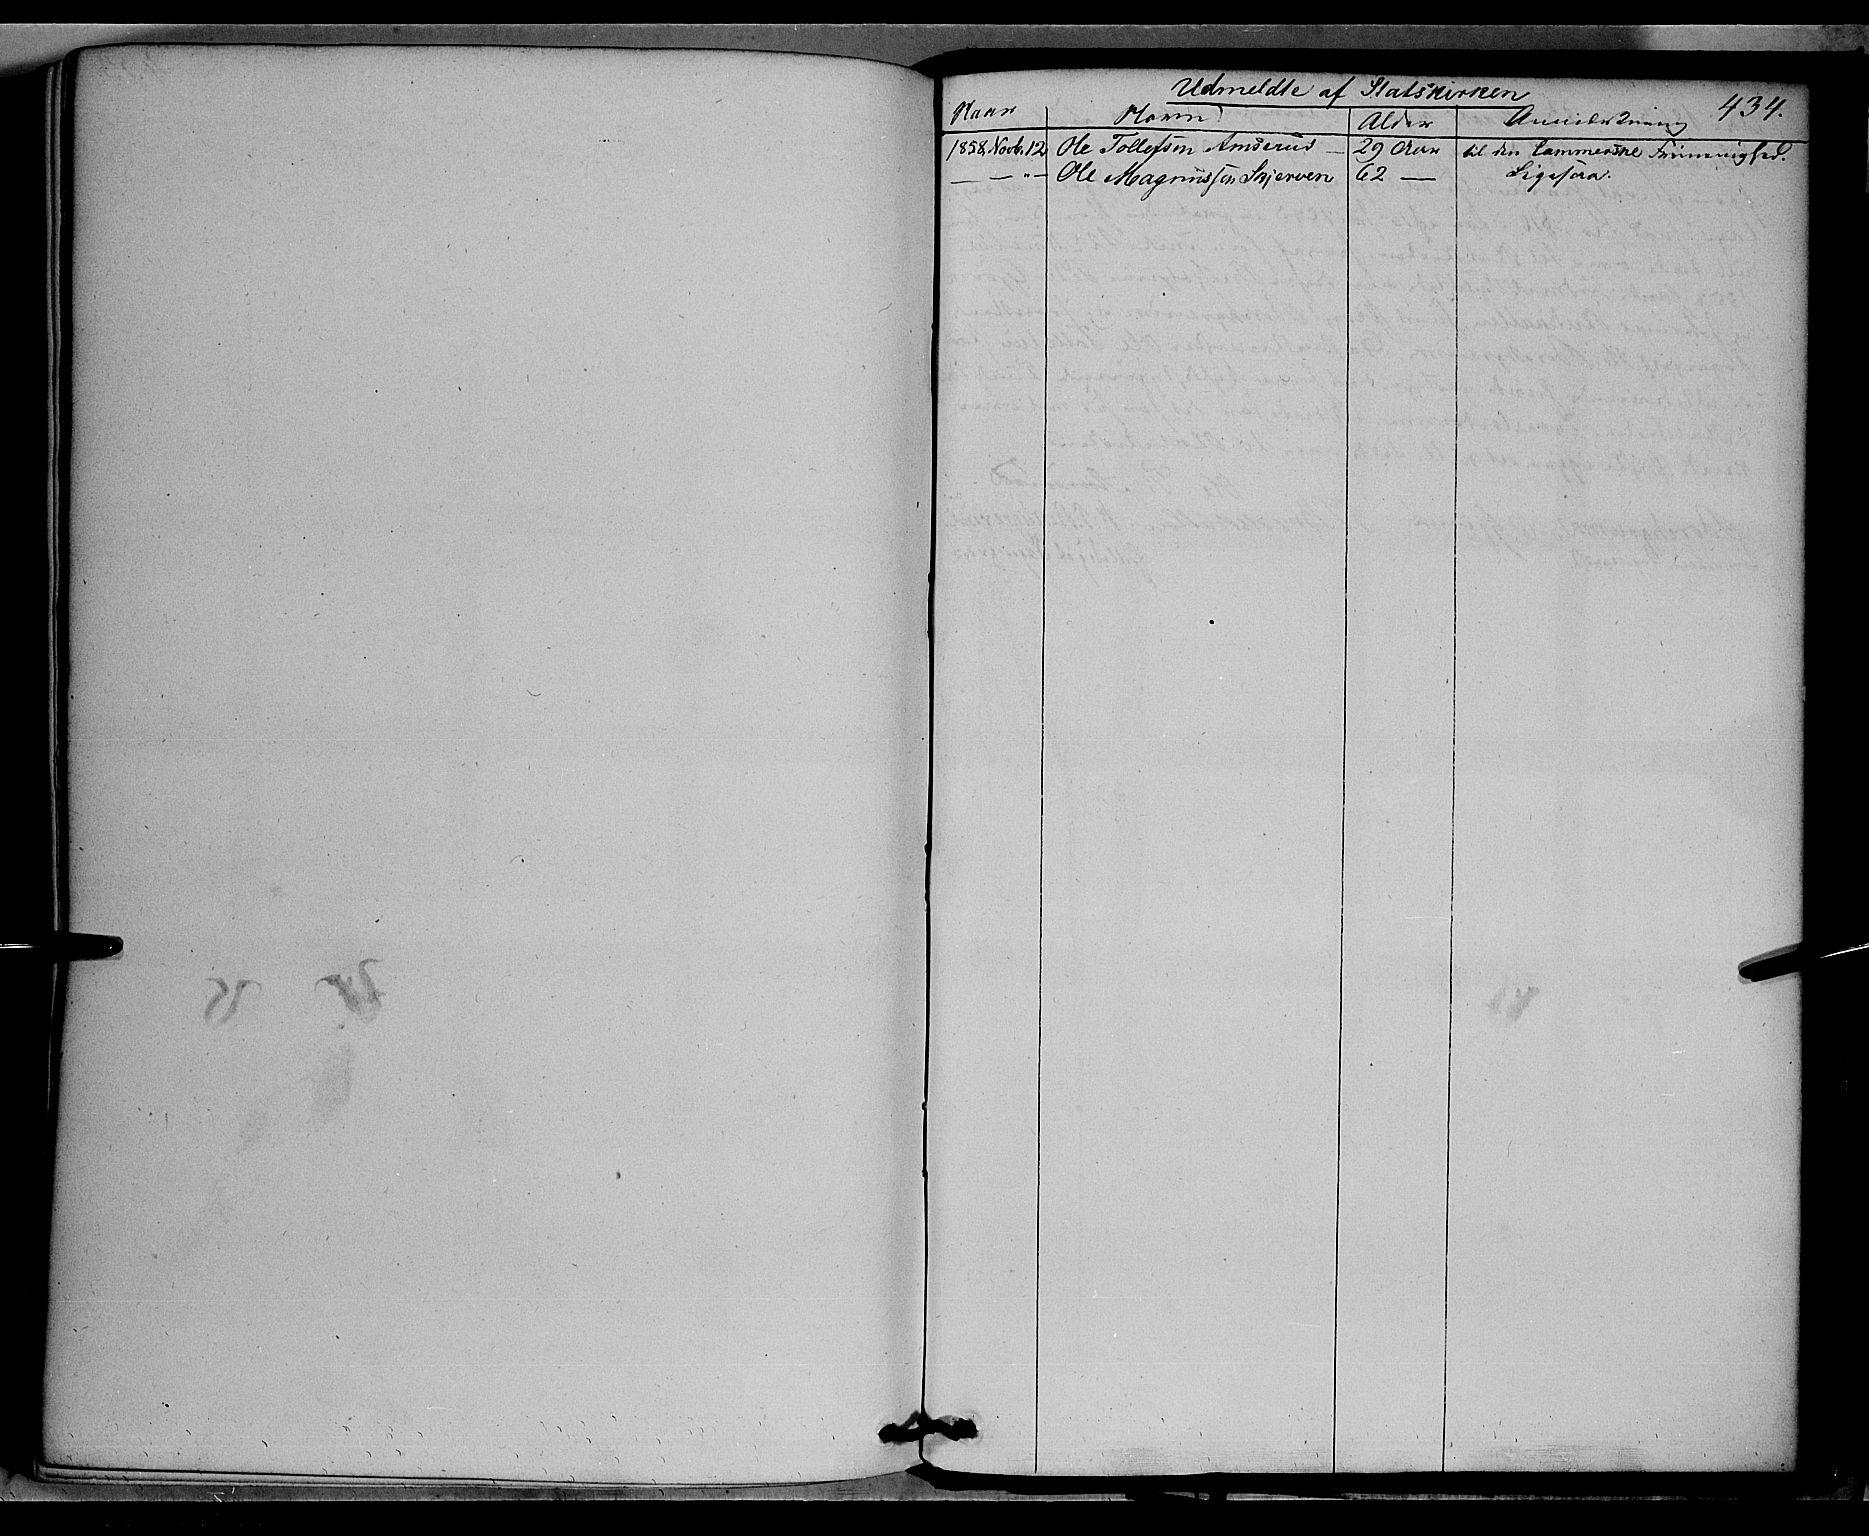 SAH, Vardal prestekontor, H/Ha/Haa/L0006: Ministerialbok nr. 6, 1854-1866, s. 434